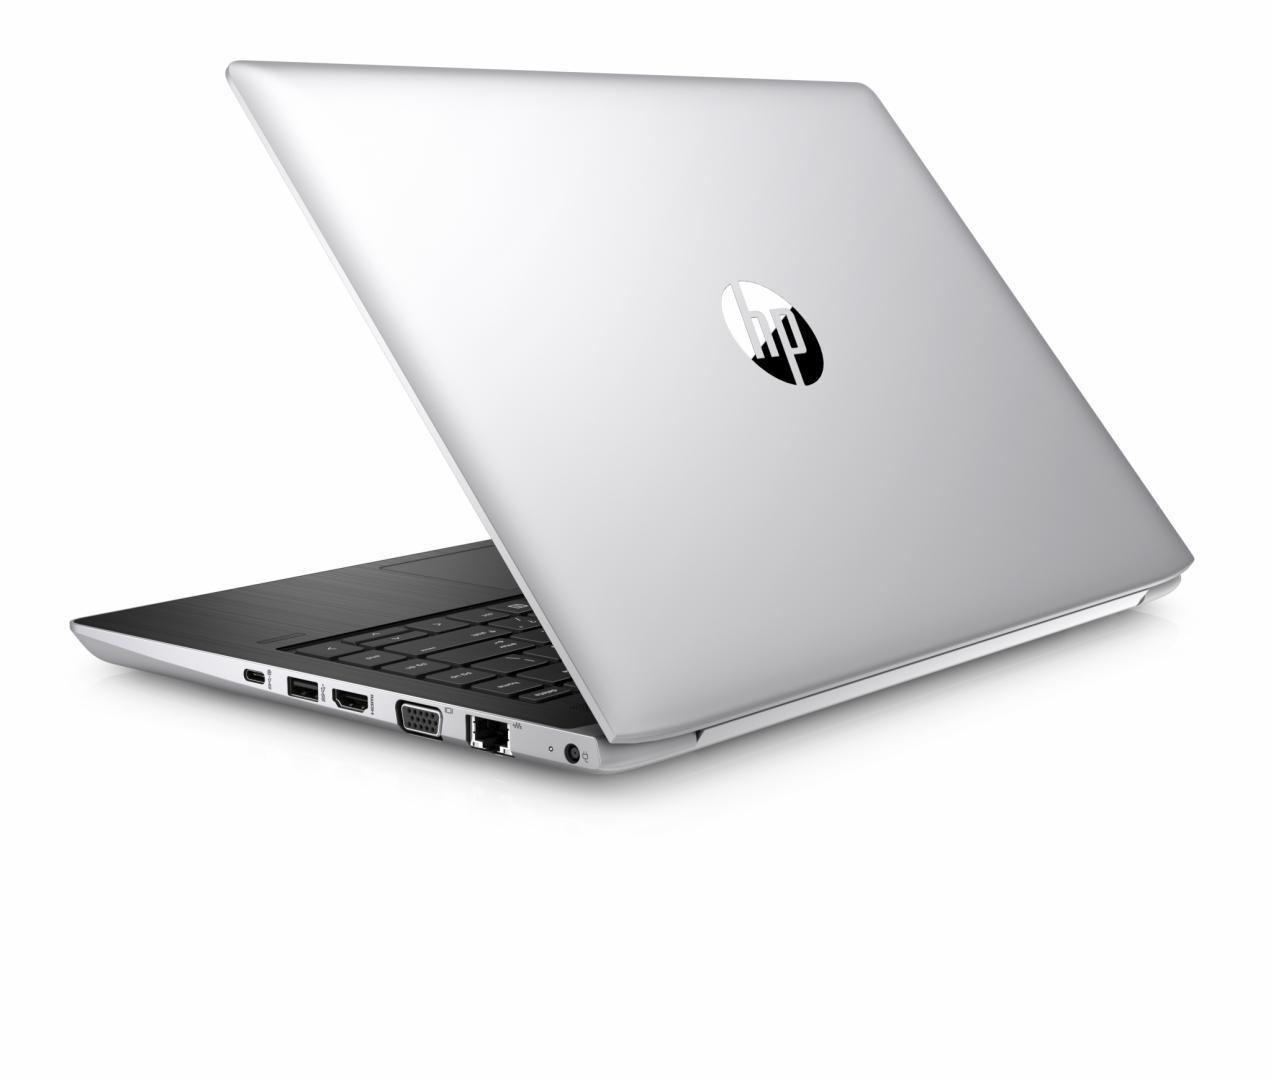 "Laptop HP ProBook 430G5 13.3"" FHD i5-8250U 8GB 256GB UMA W10P"